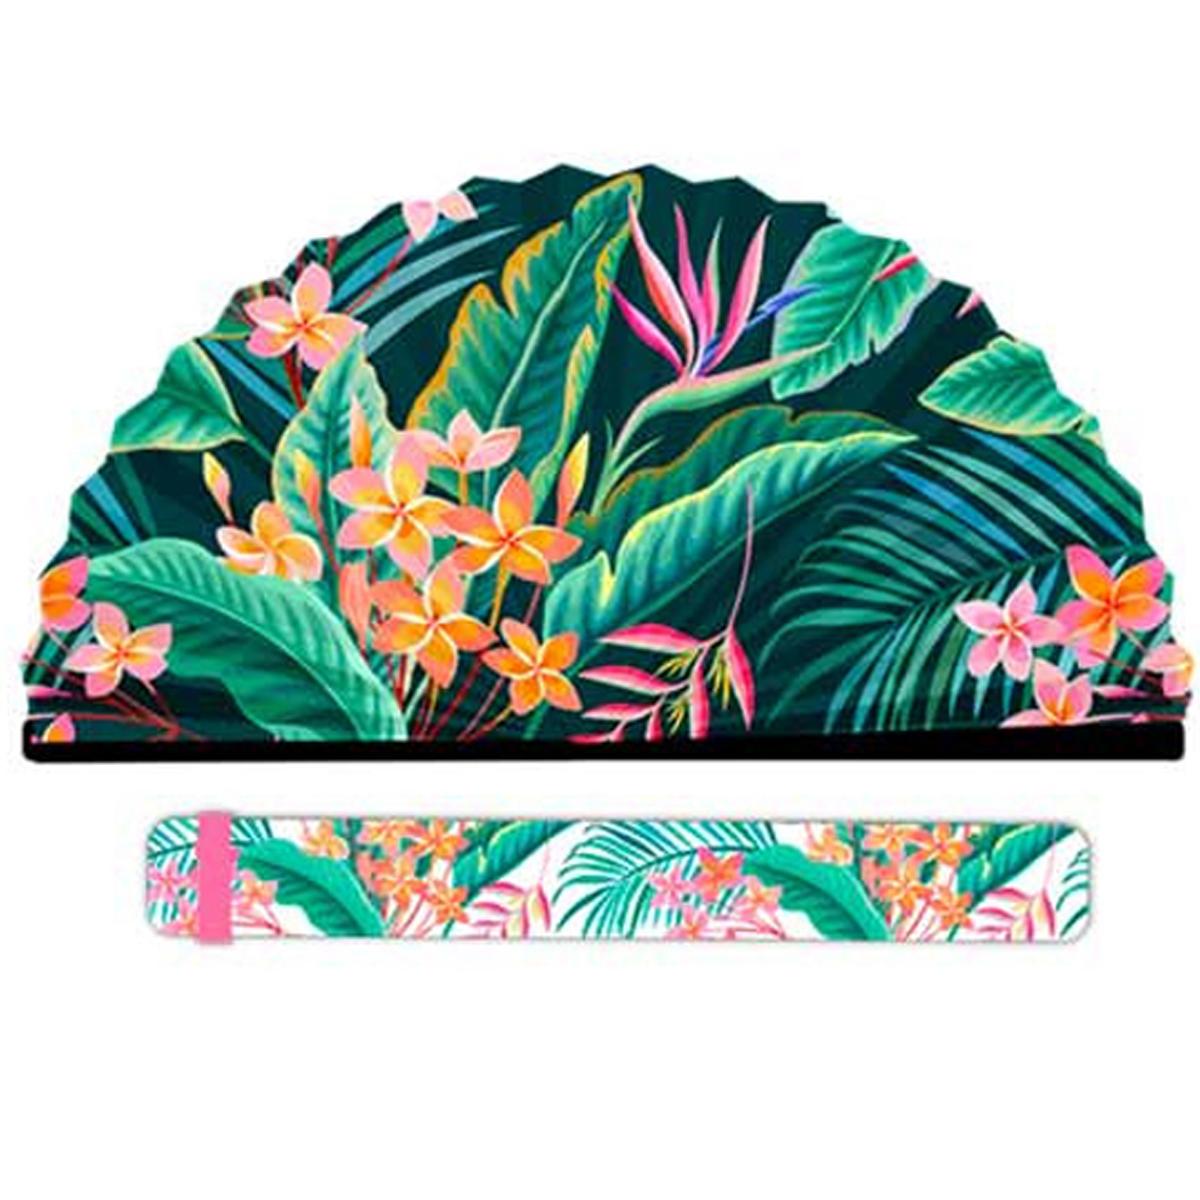 Eventail papier \'Tropical\' vert - 19x2 cm - [R2109]